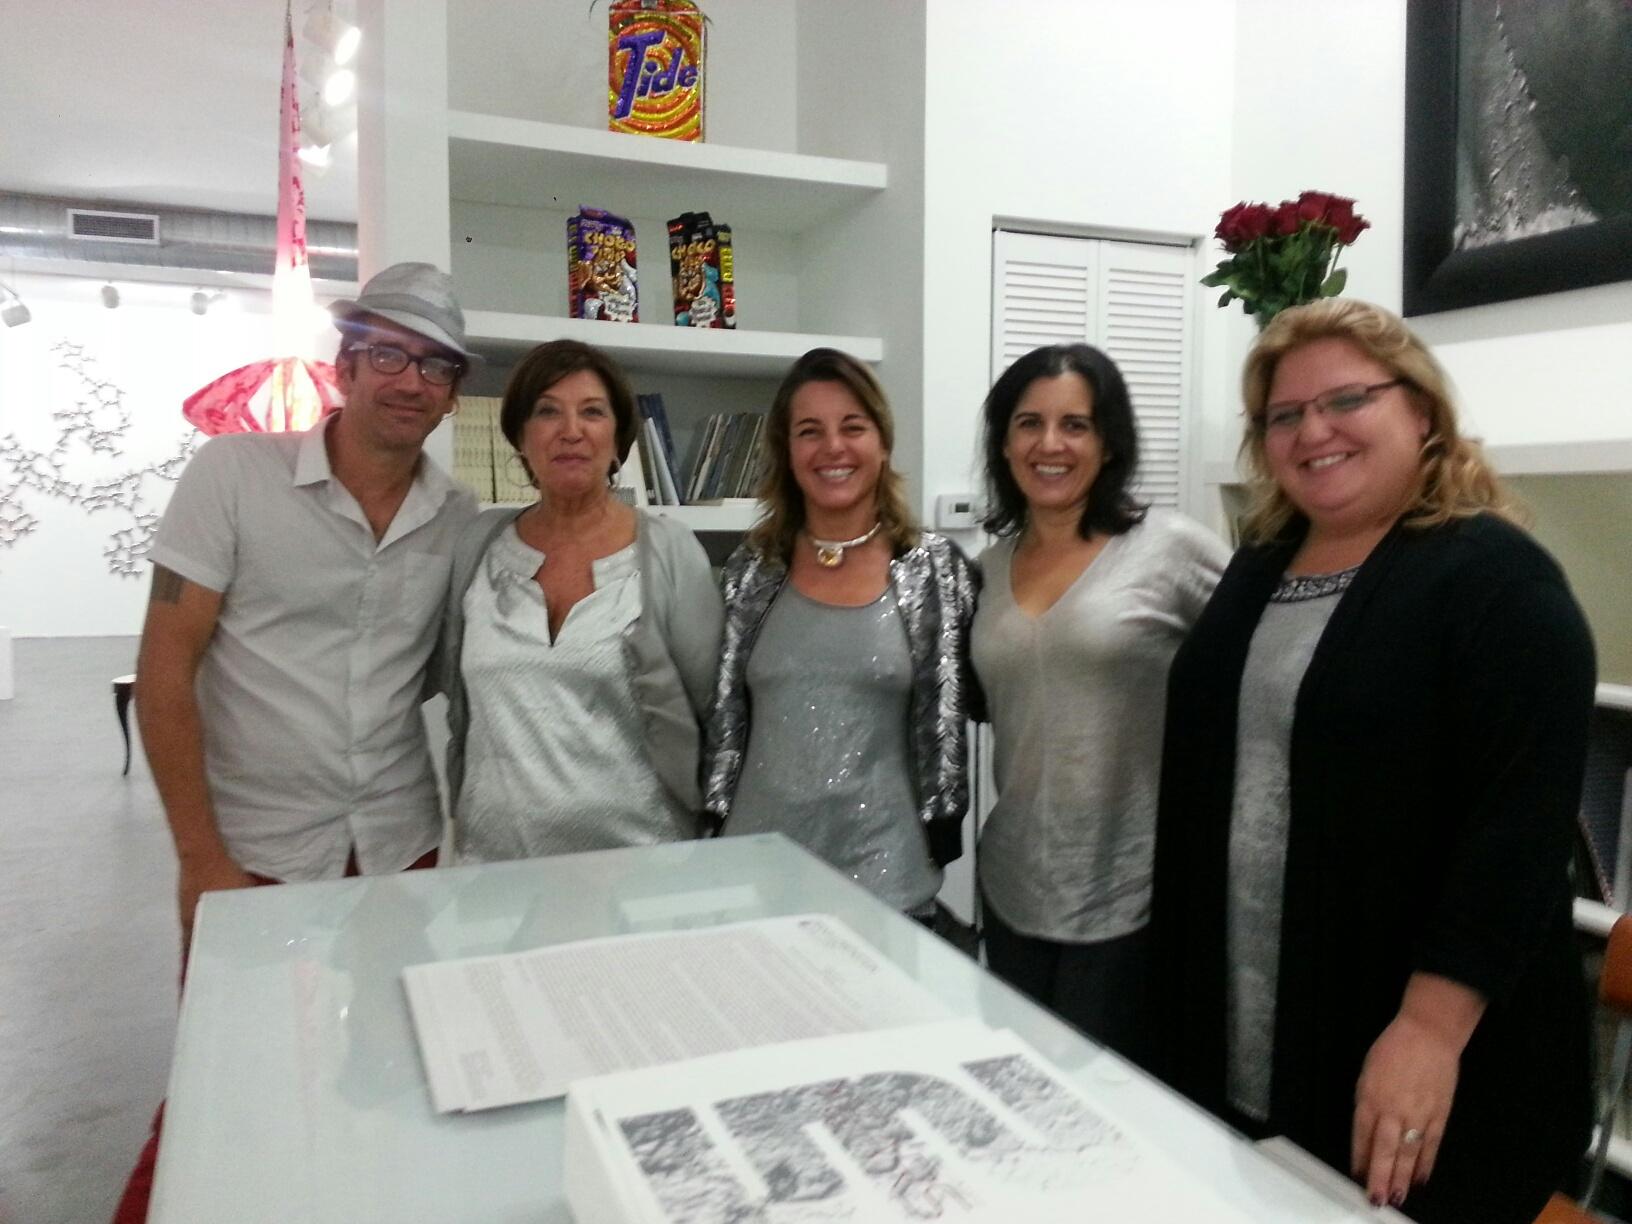 Michael, Diana, Ombretta, Laurie, Juliana